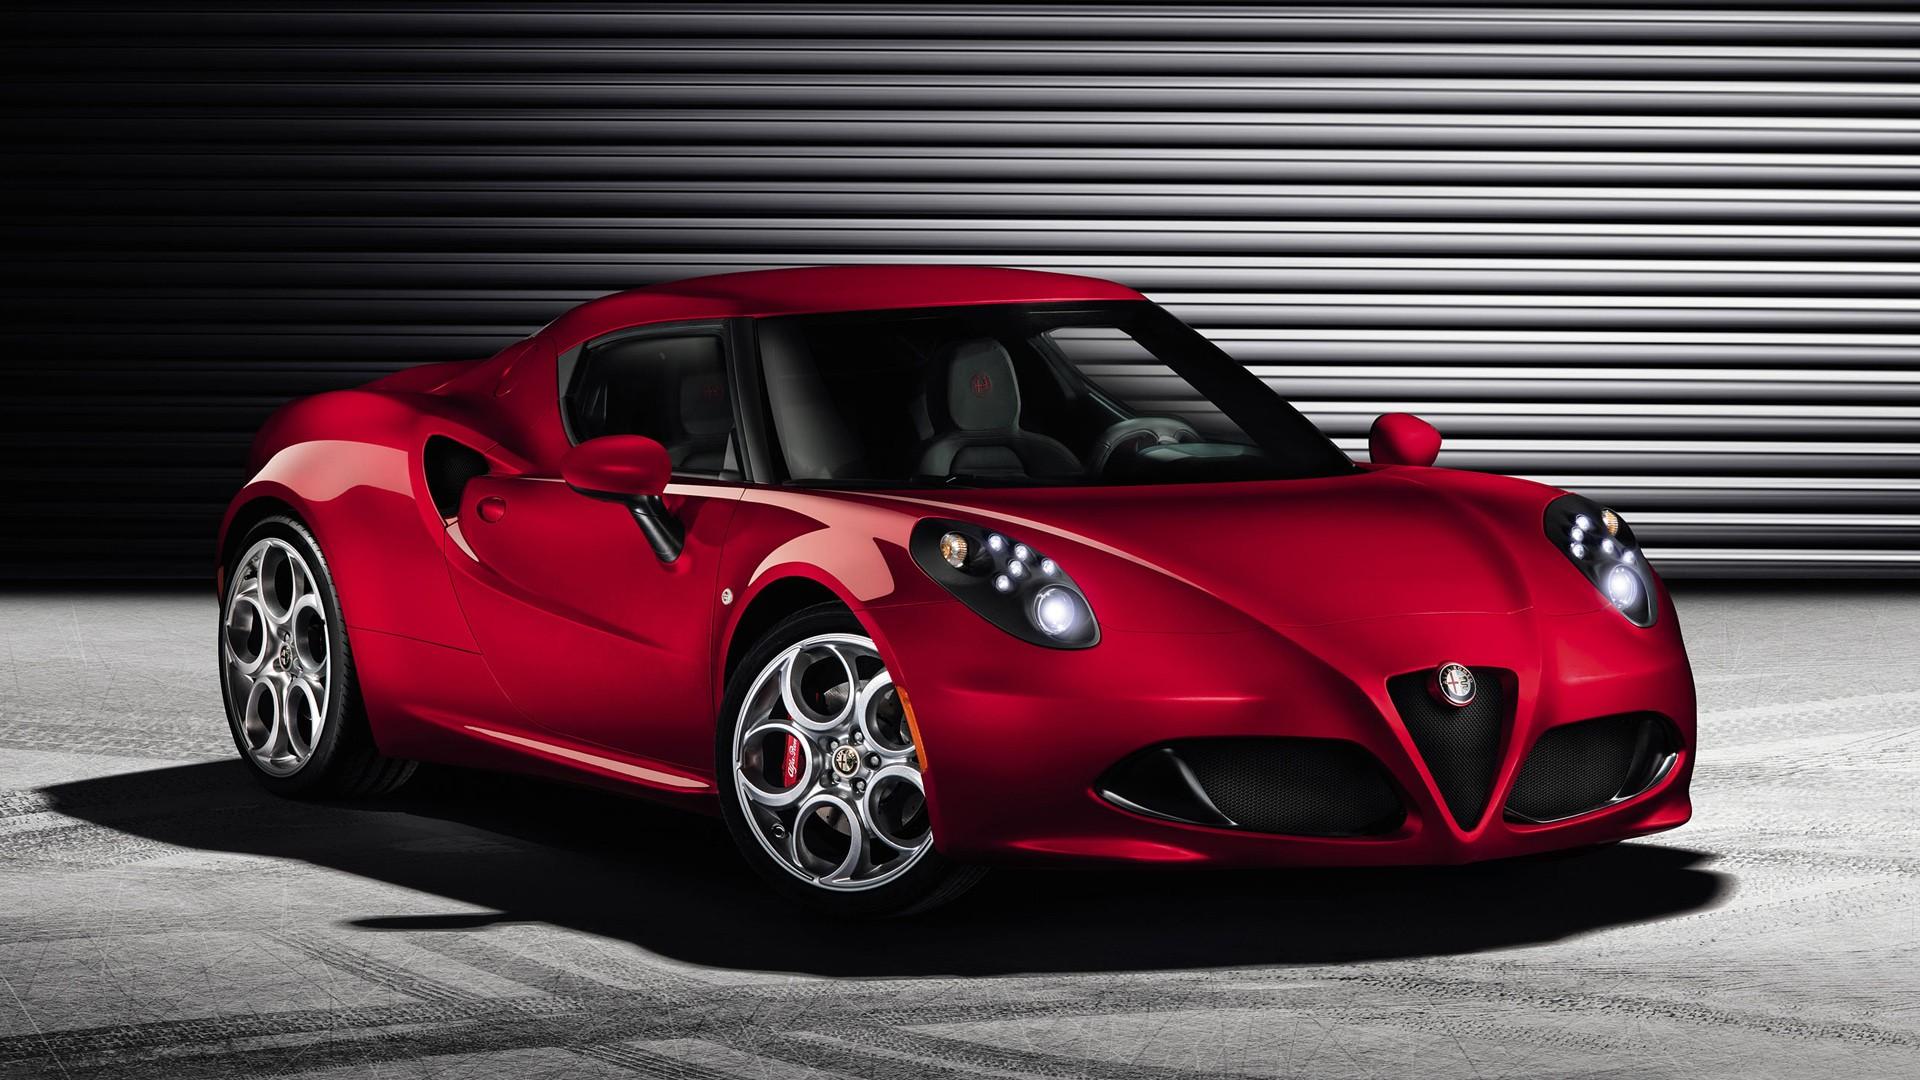 Alfa Romeo 4C >> 2013 Alfa Romeo 4C Wallpaper | HD Car Wallpapers | ID #3257